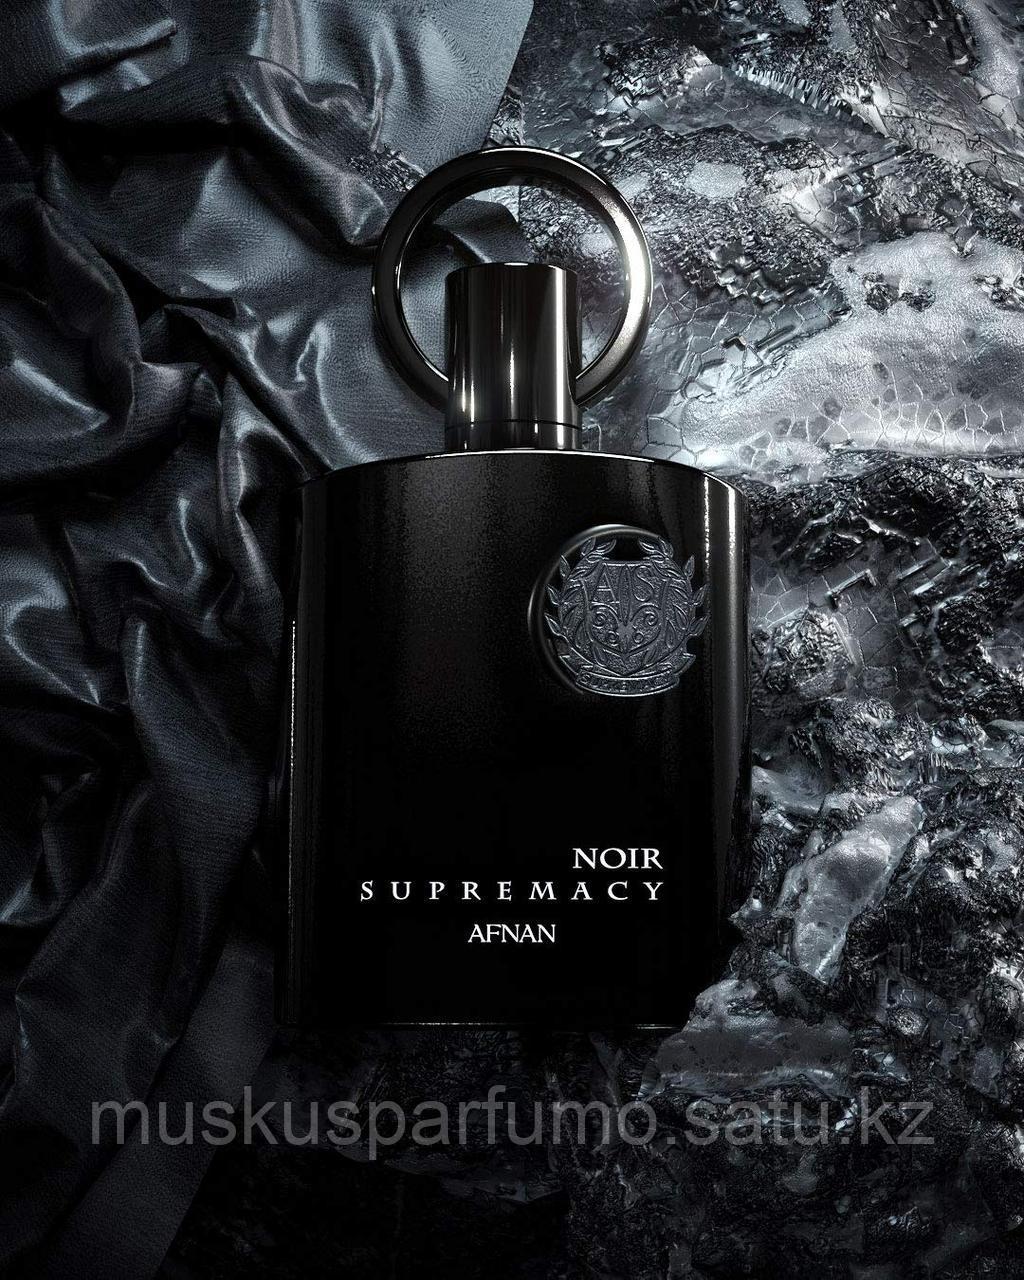 Supremacy Noir Afnan Perfumes Мужской 100 ml оригинал - фото 4